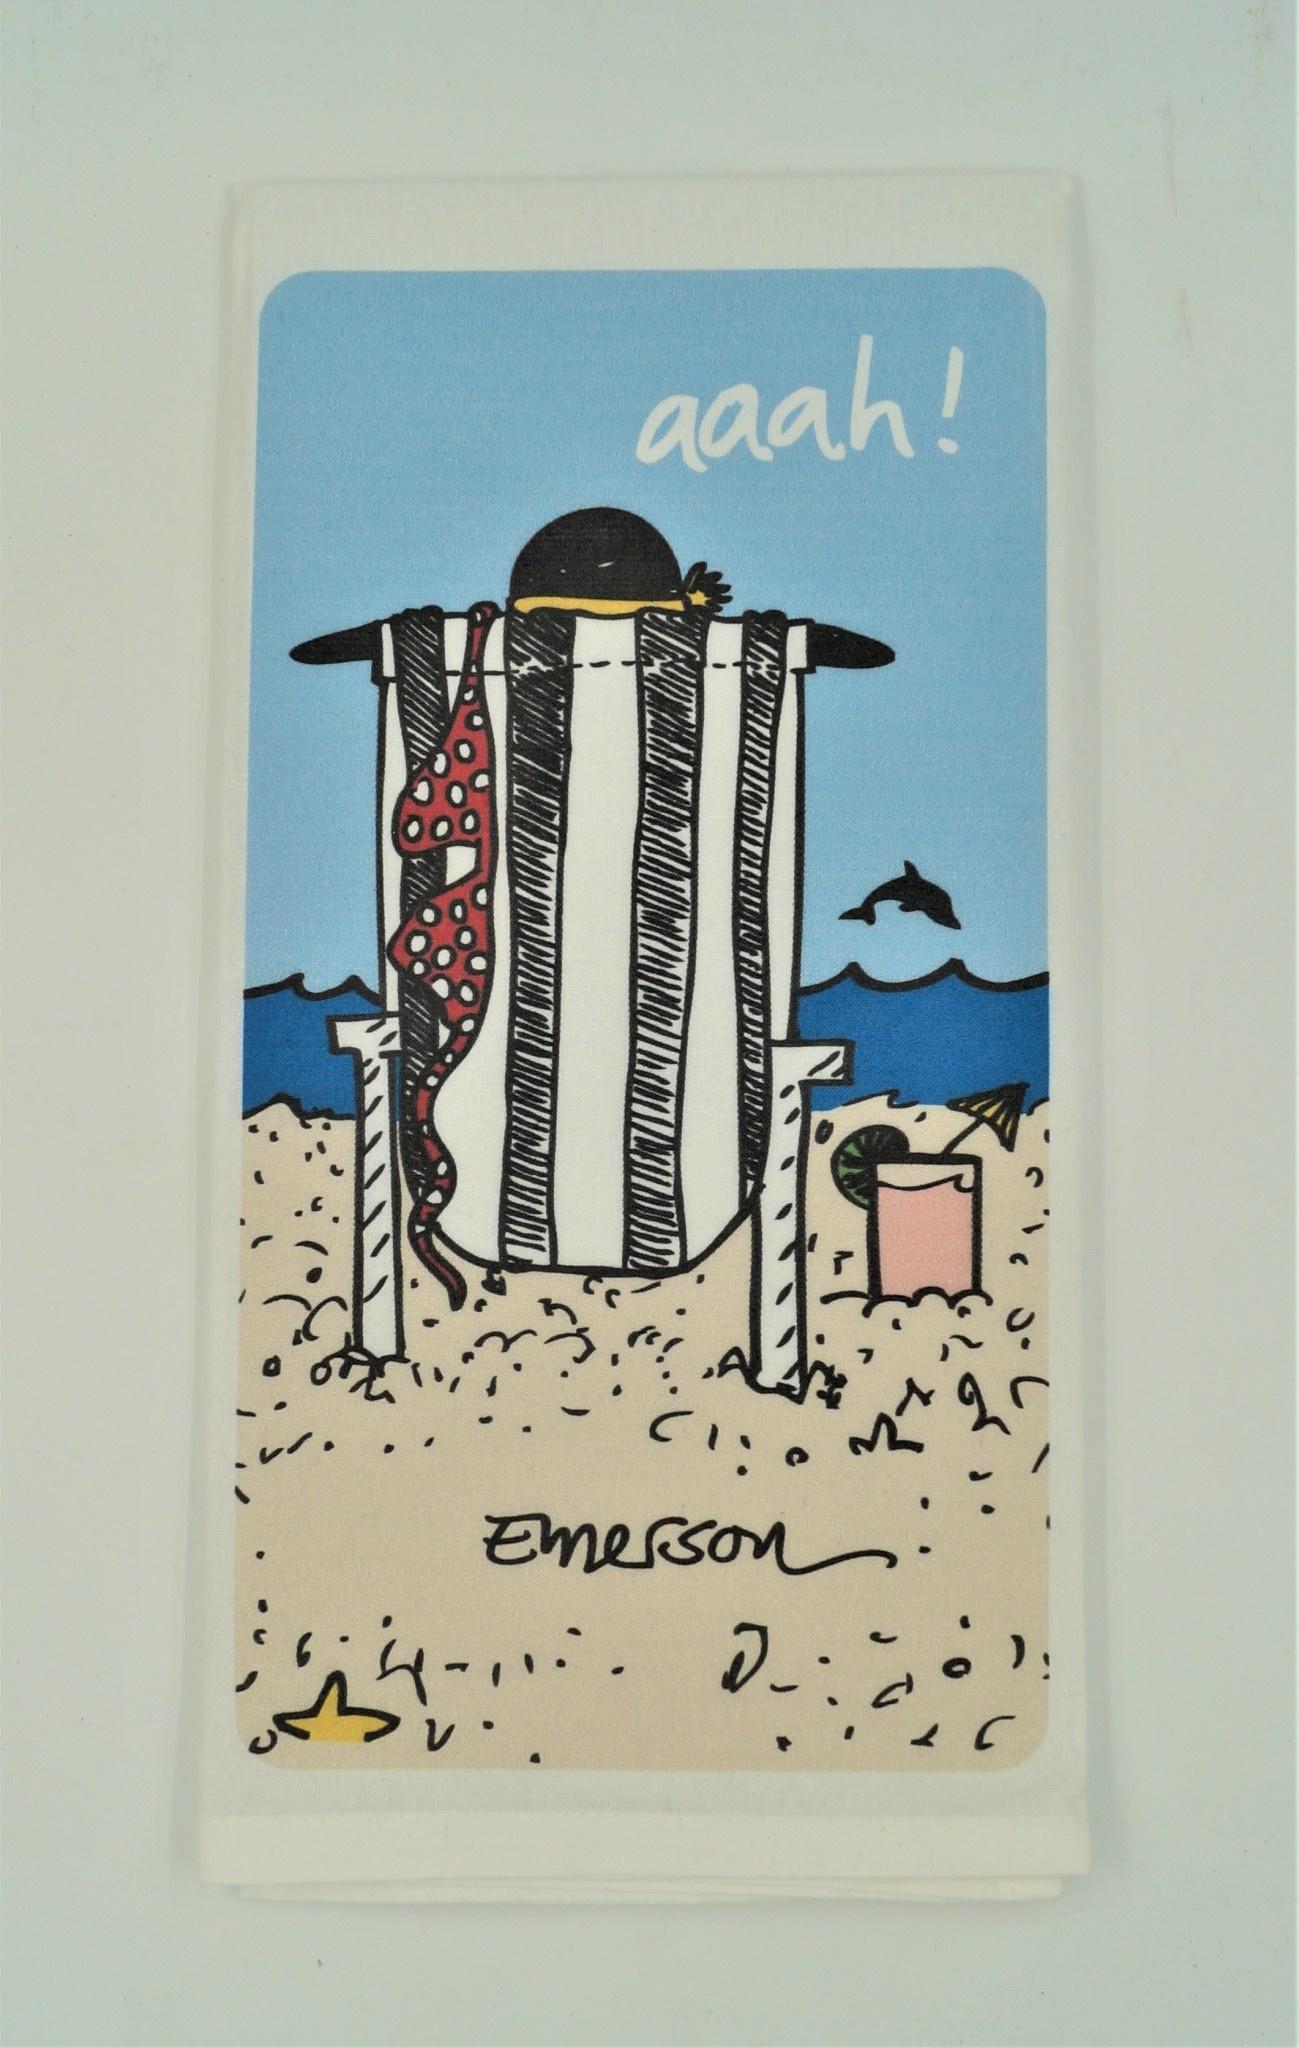 AAAH Kitchen Towel